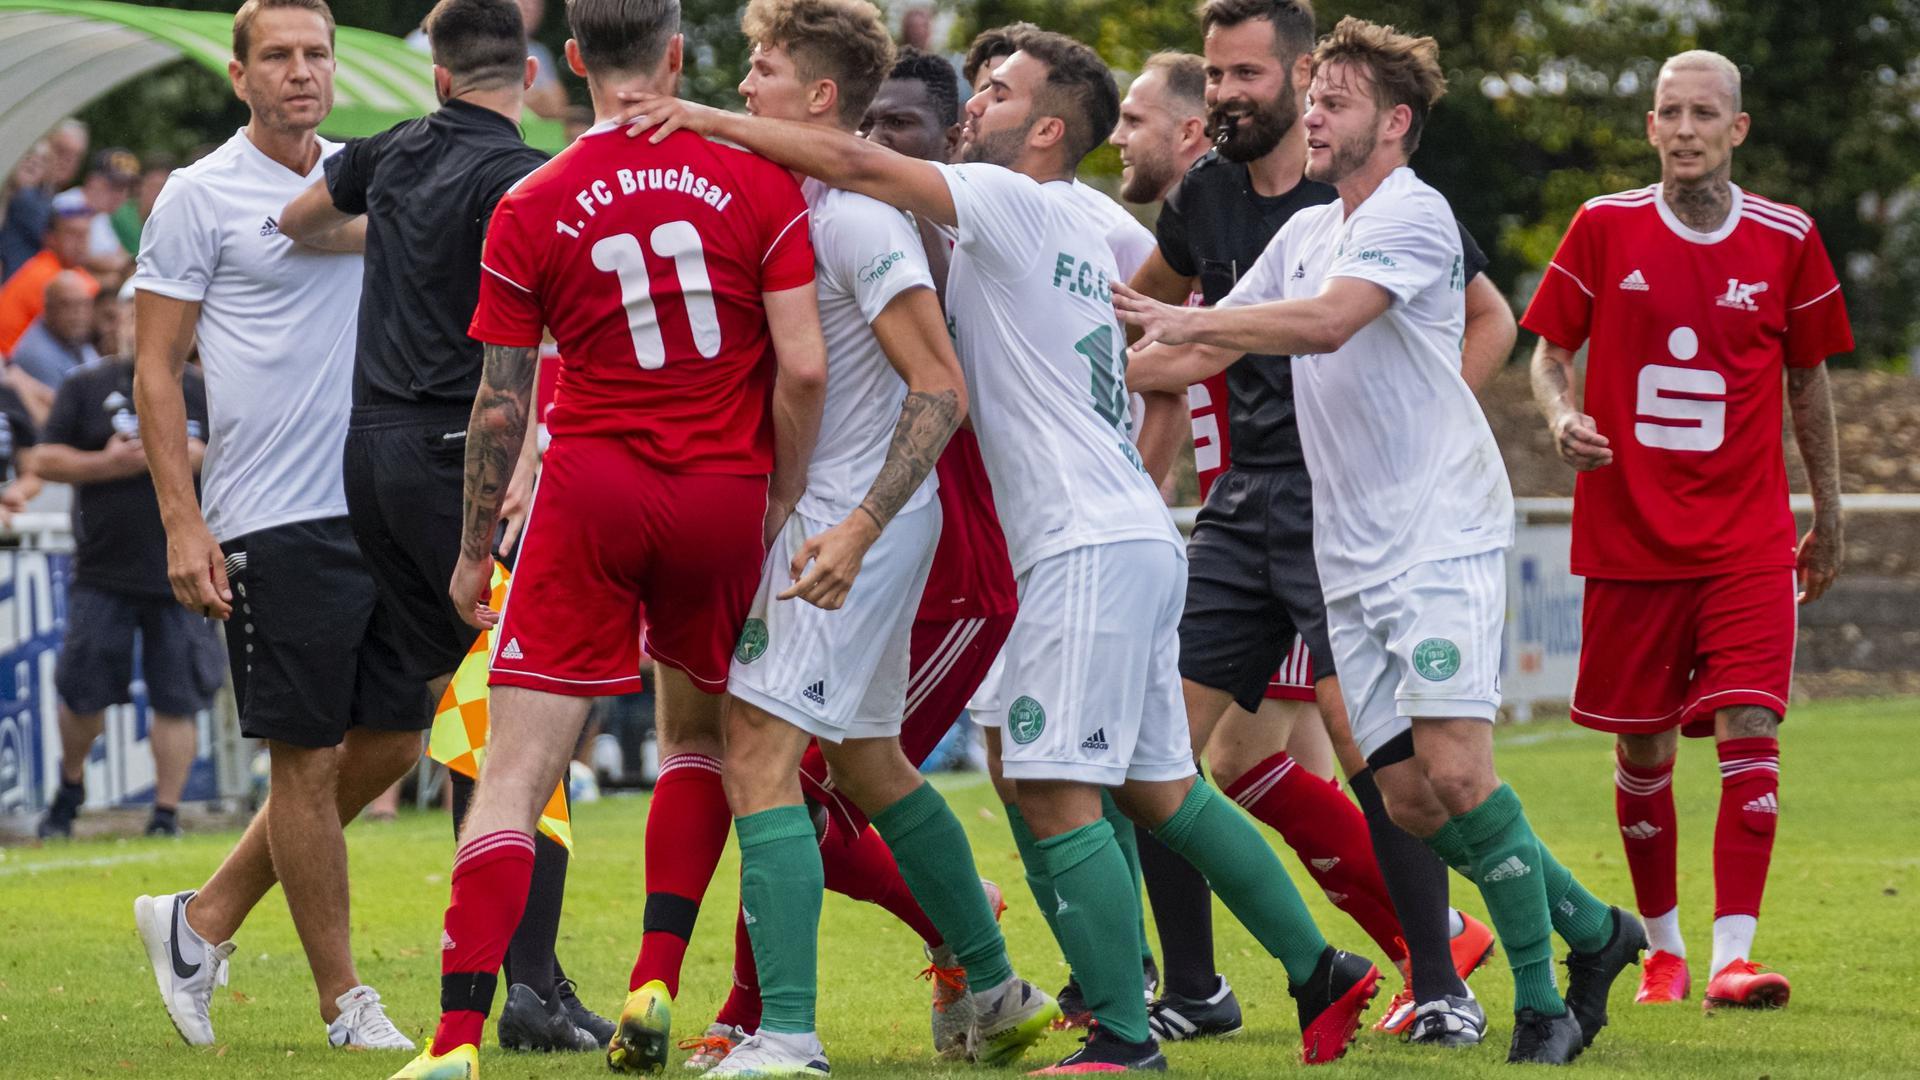 FC Kirrlach gegen 1. FC Bruchsal, Rudelbildung